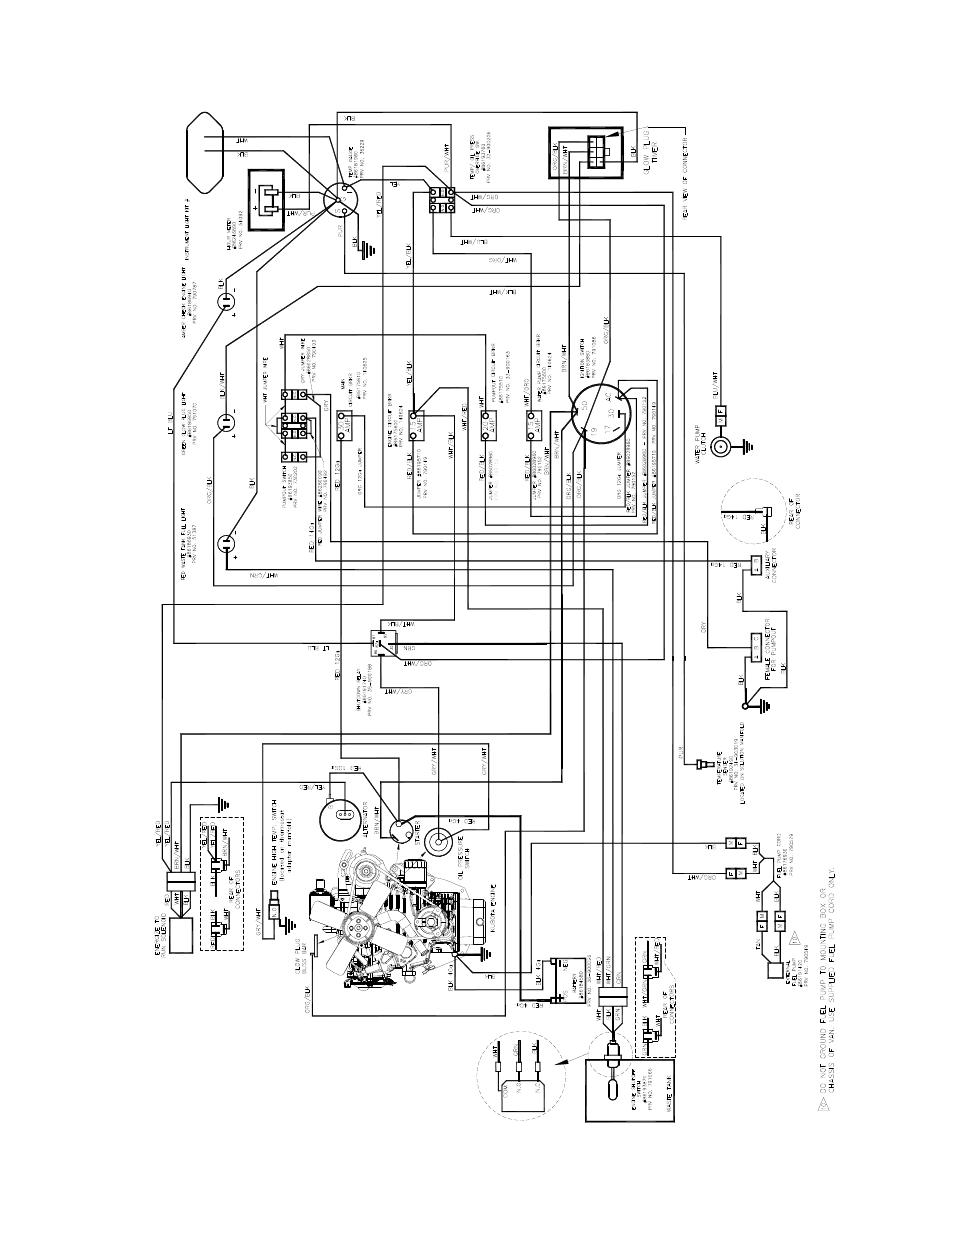 John Deere 116 Wiring Diagram